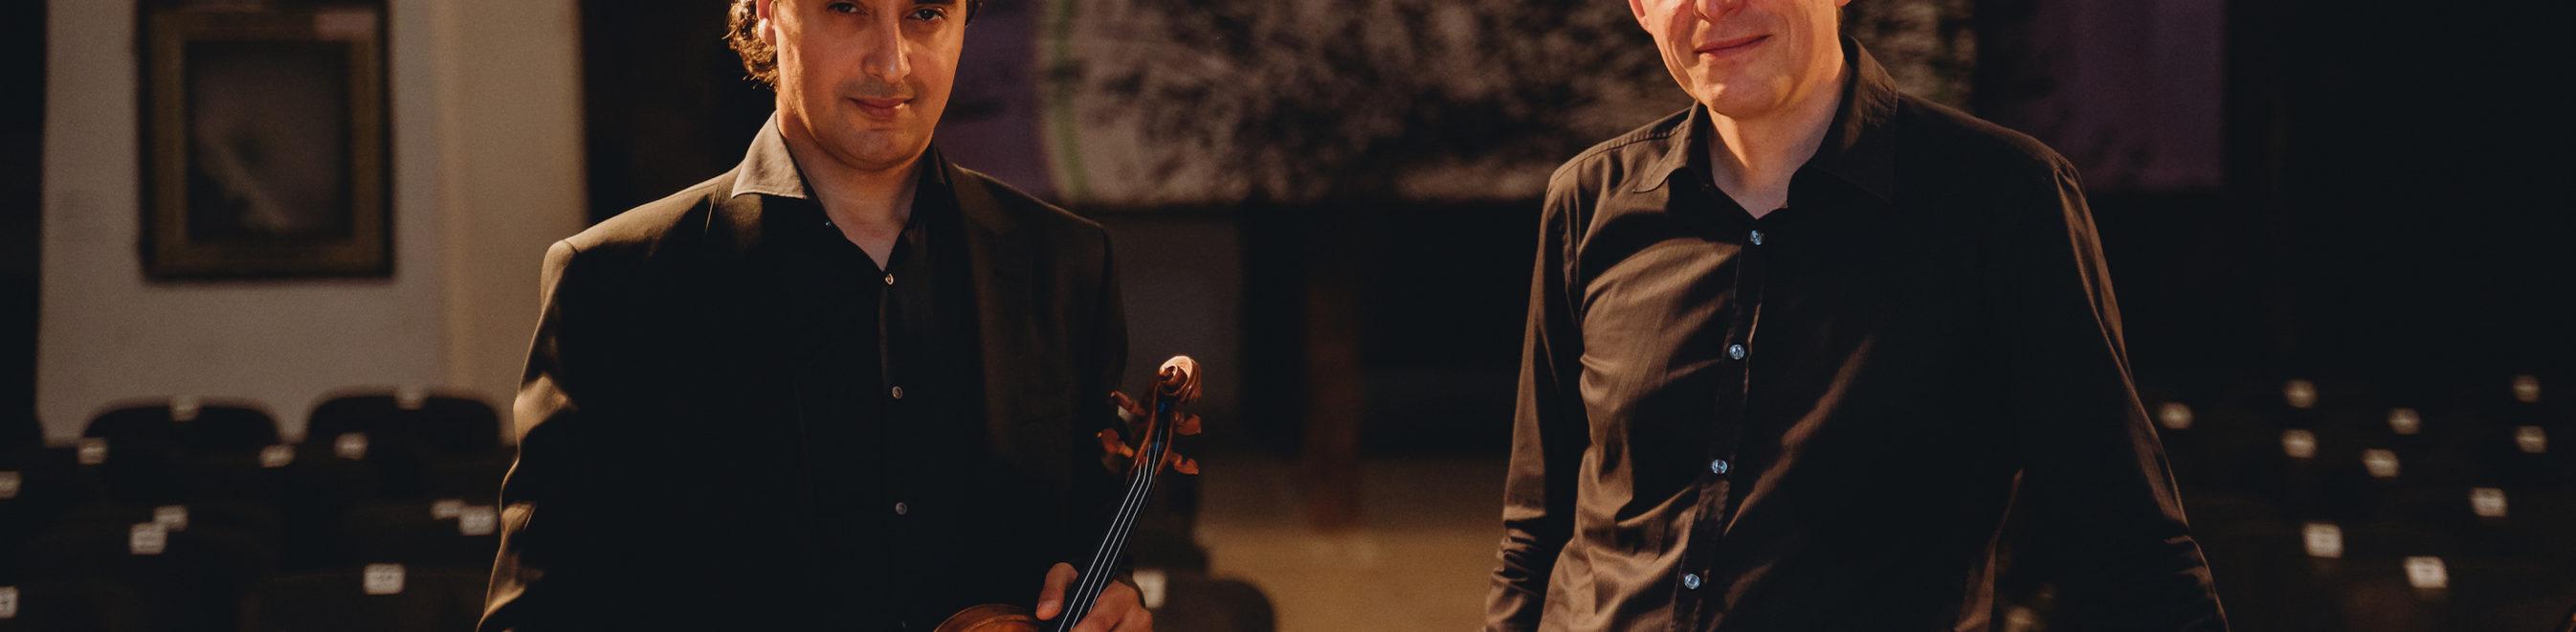 12/03 - Progetto Beethoven 1: La Sonata a Kreutzer